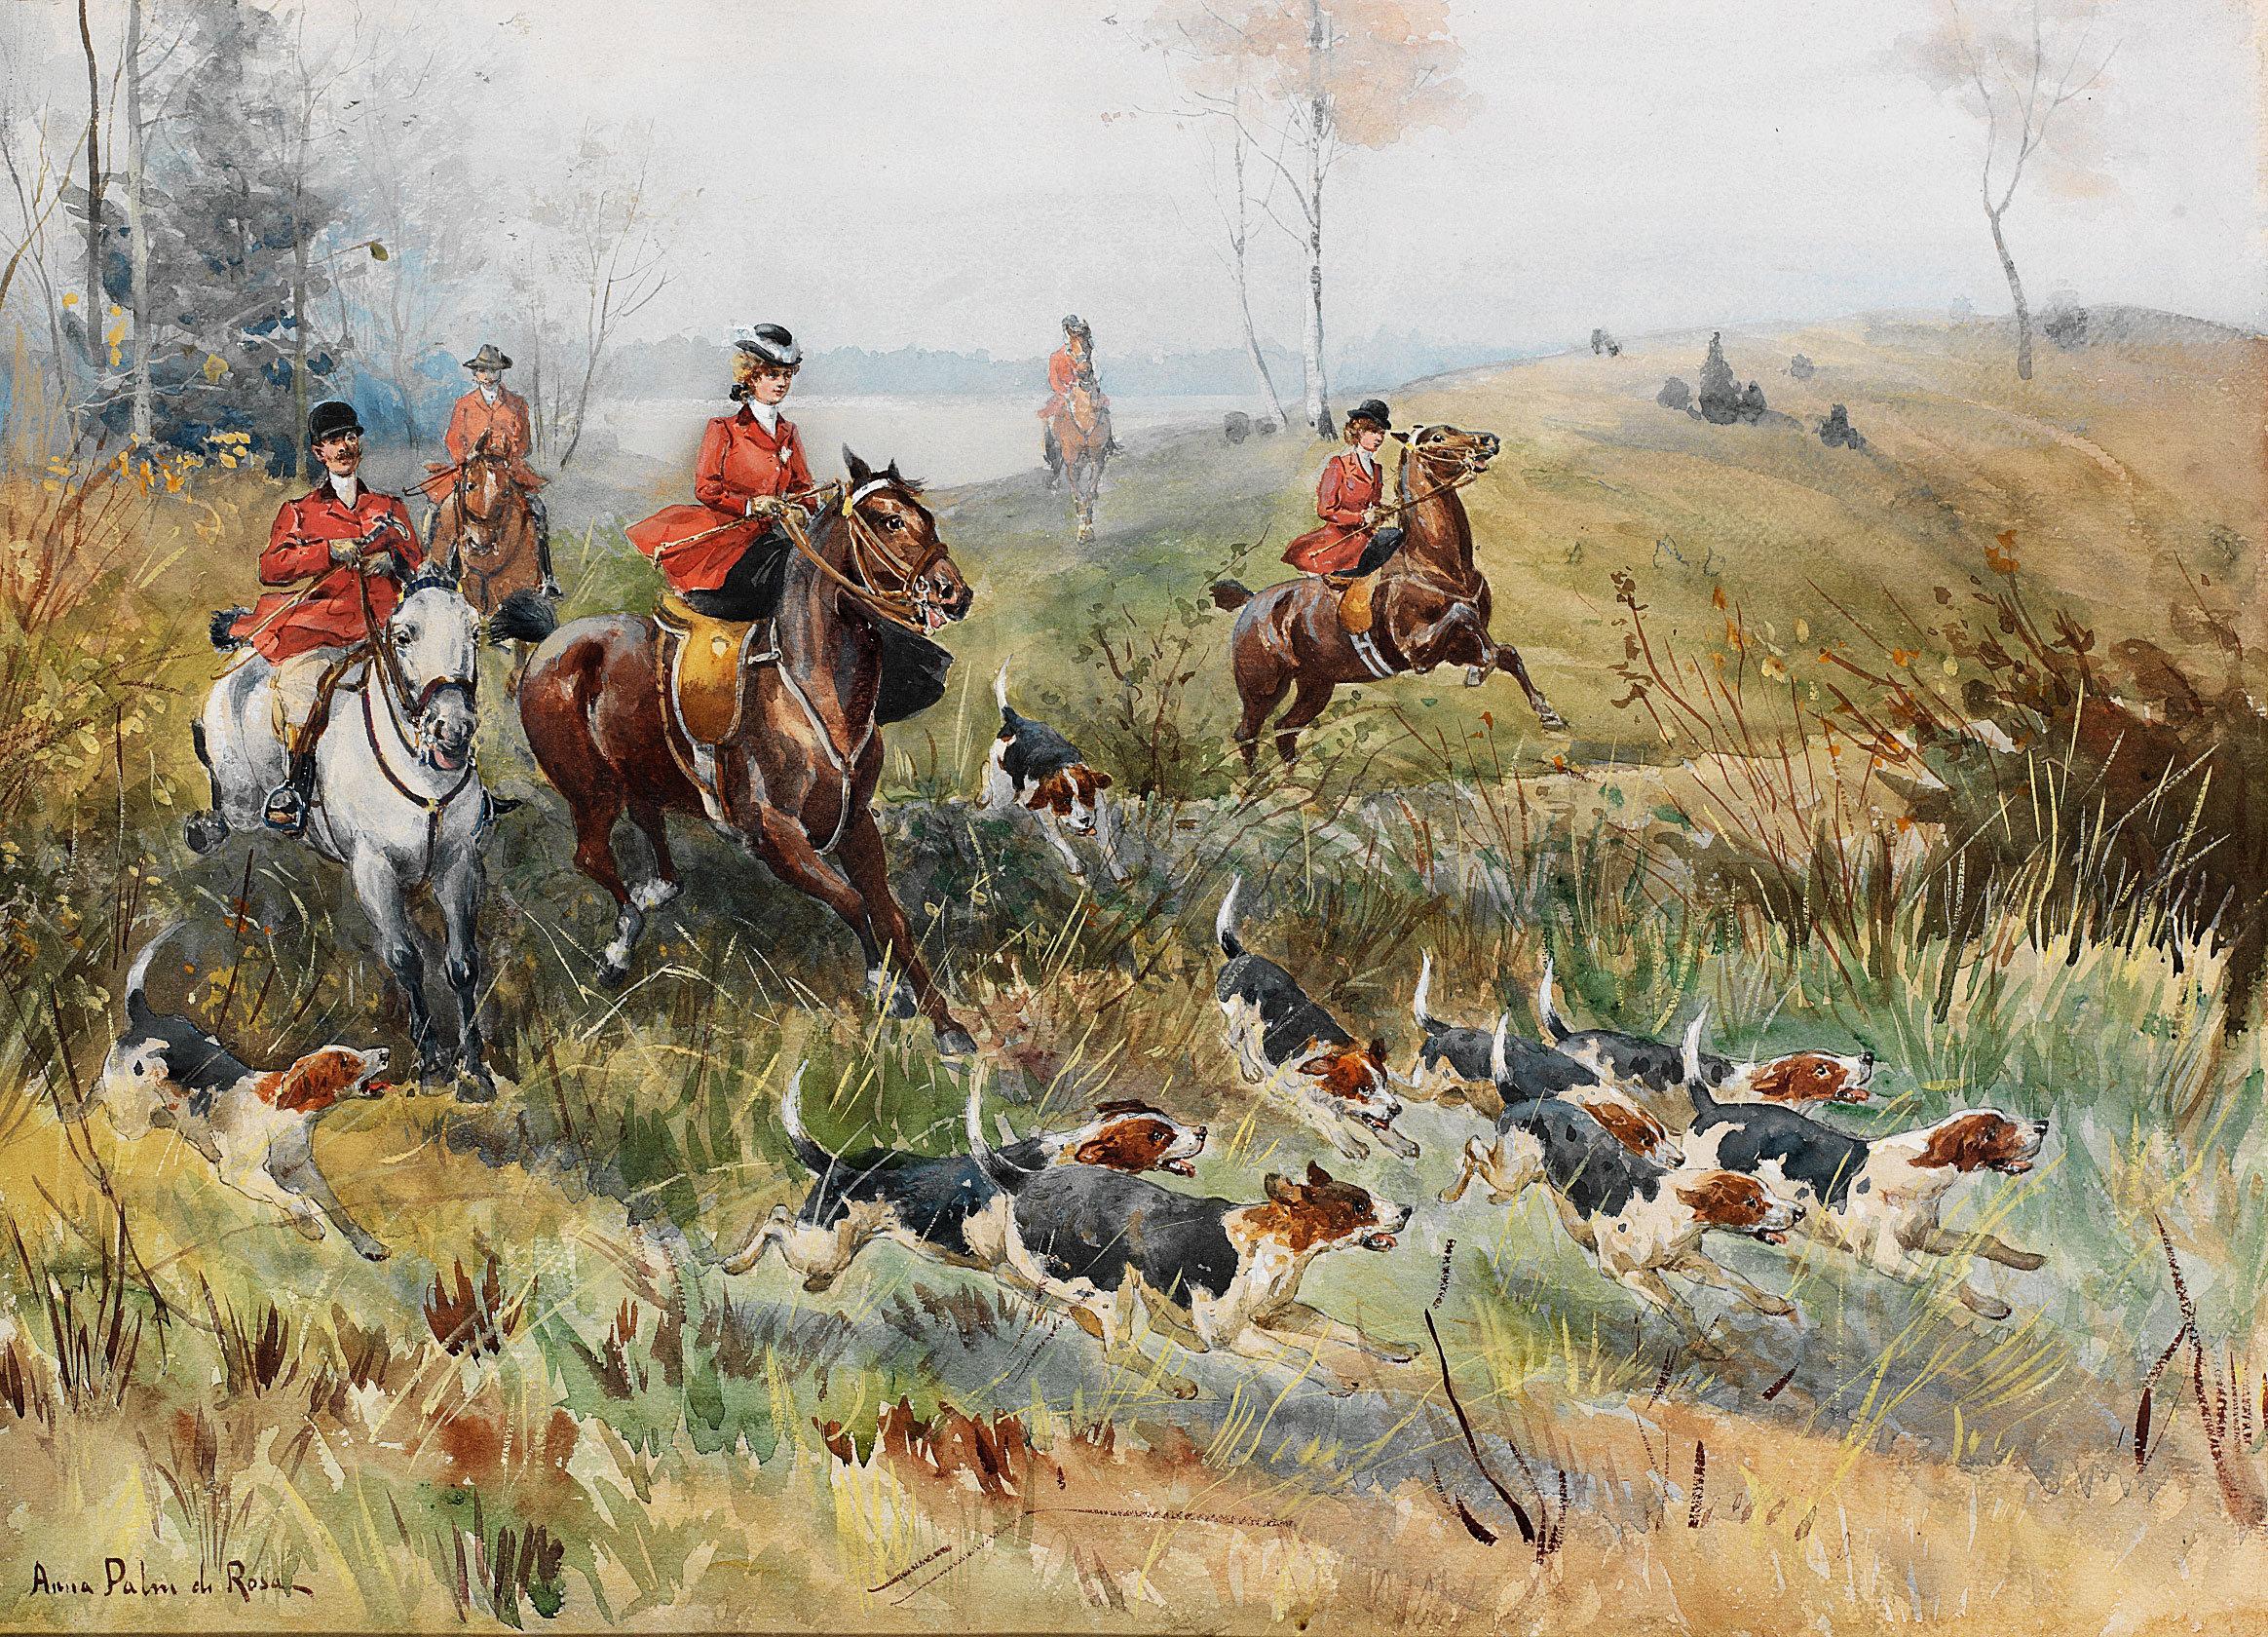 anna palm de rosa rvjakt fox hunting hunting hunters horses dogs 2328x1680